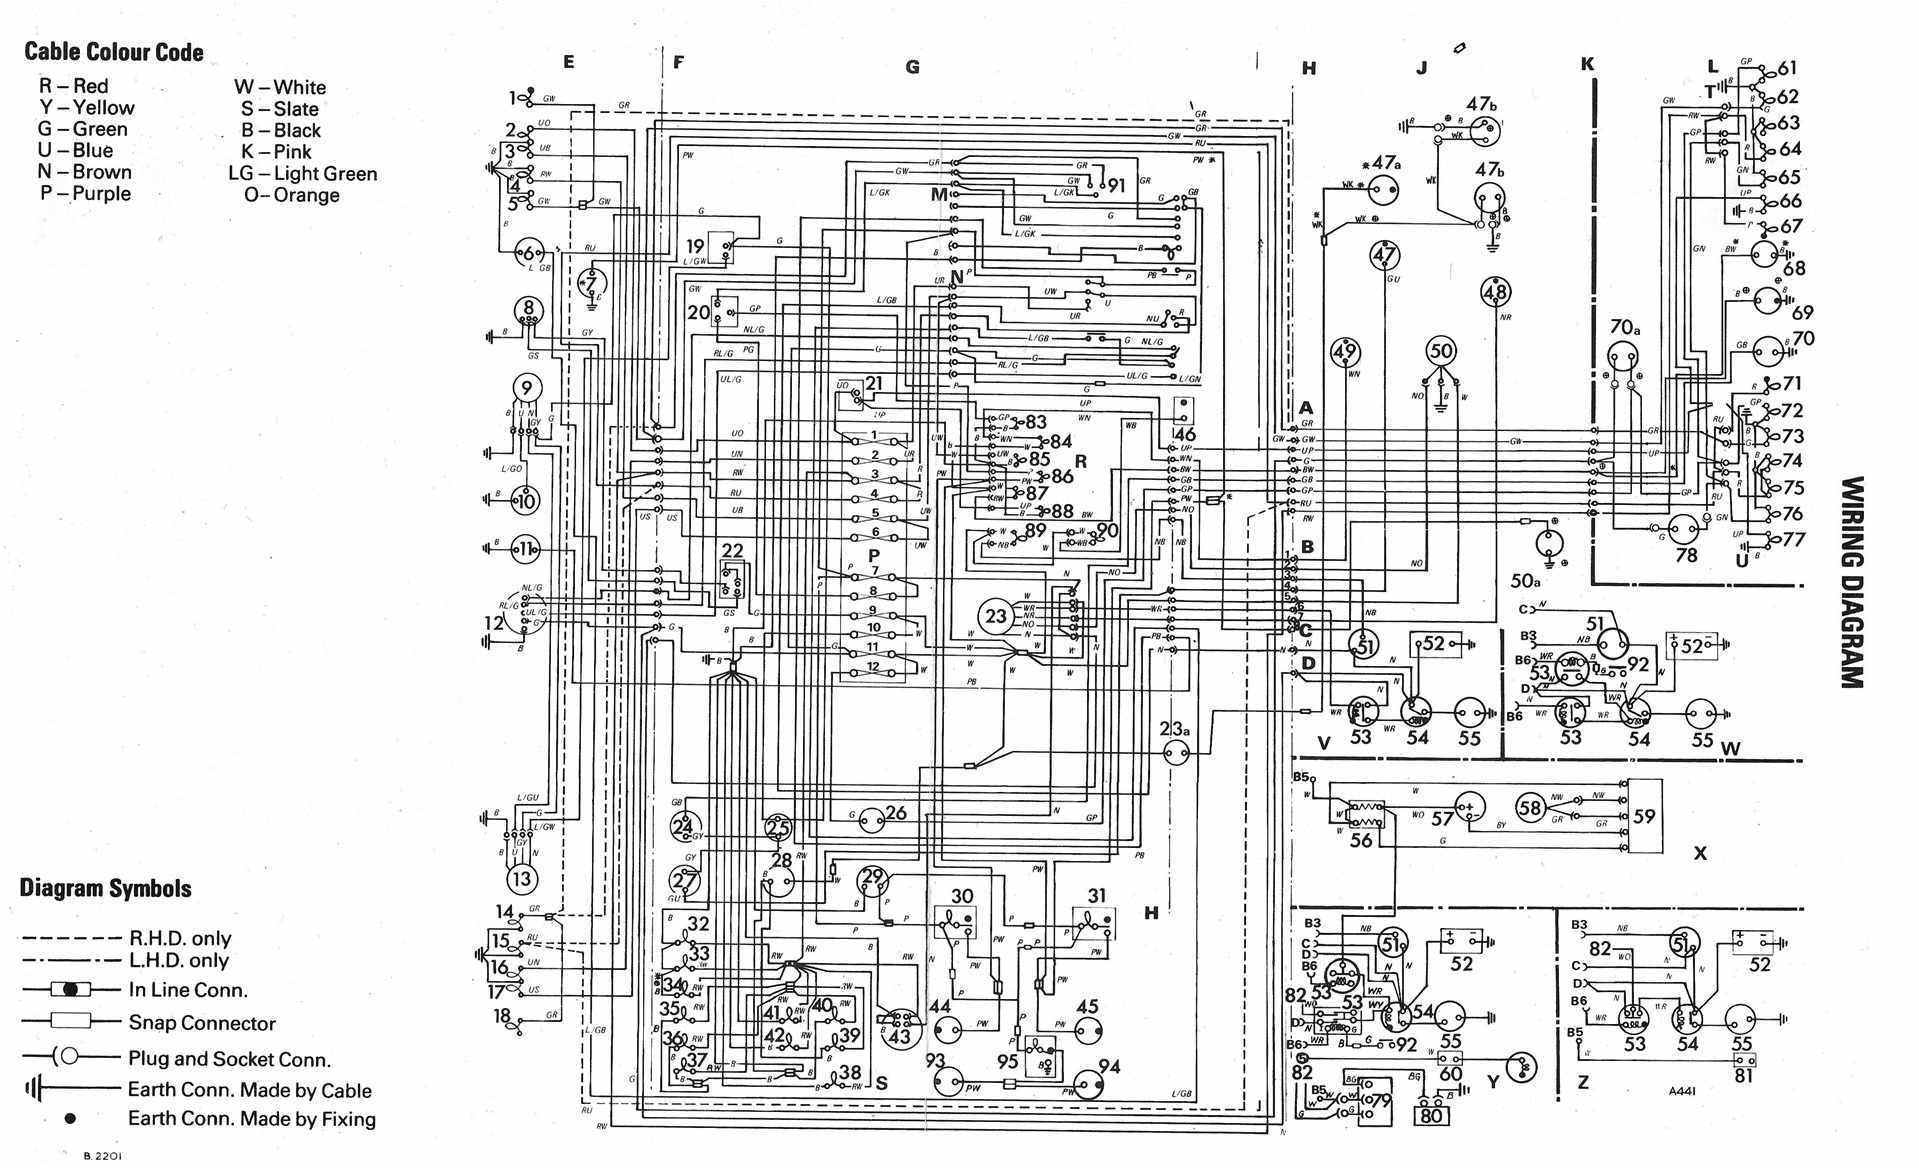 1998 Vw Cabrio Ac Wiring 3 Way Bass Wiring Diagram 1990 300zx Ikikik Jeanjaures37 Fr